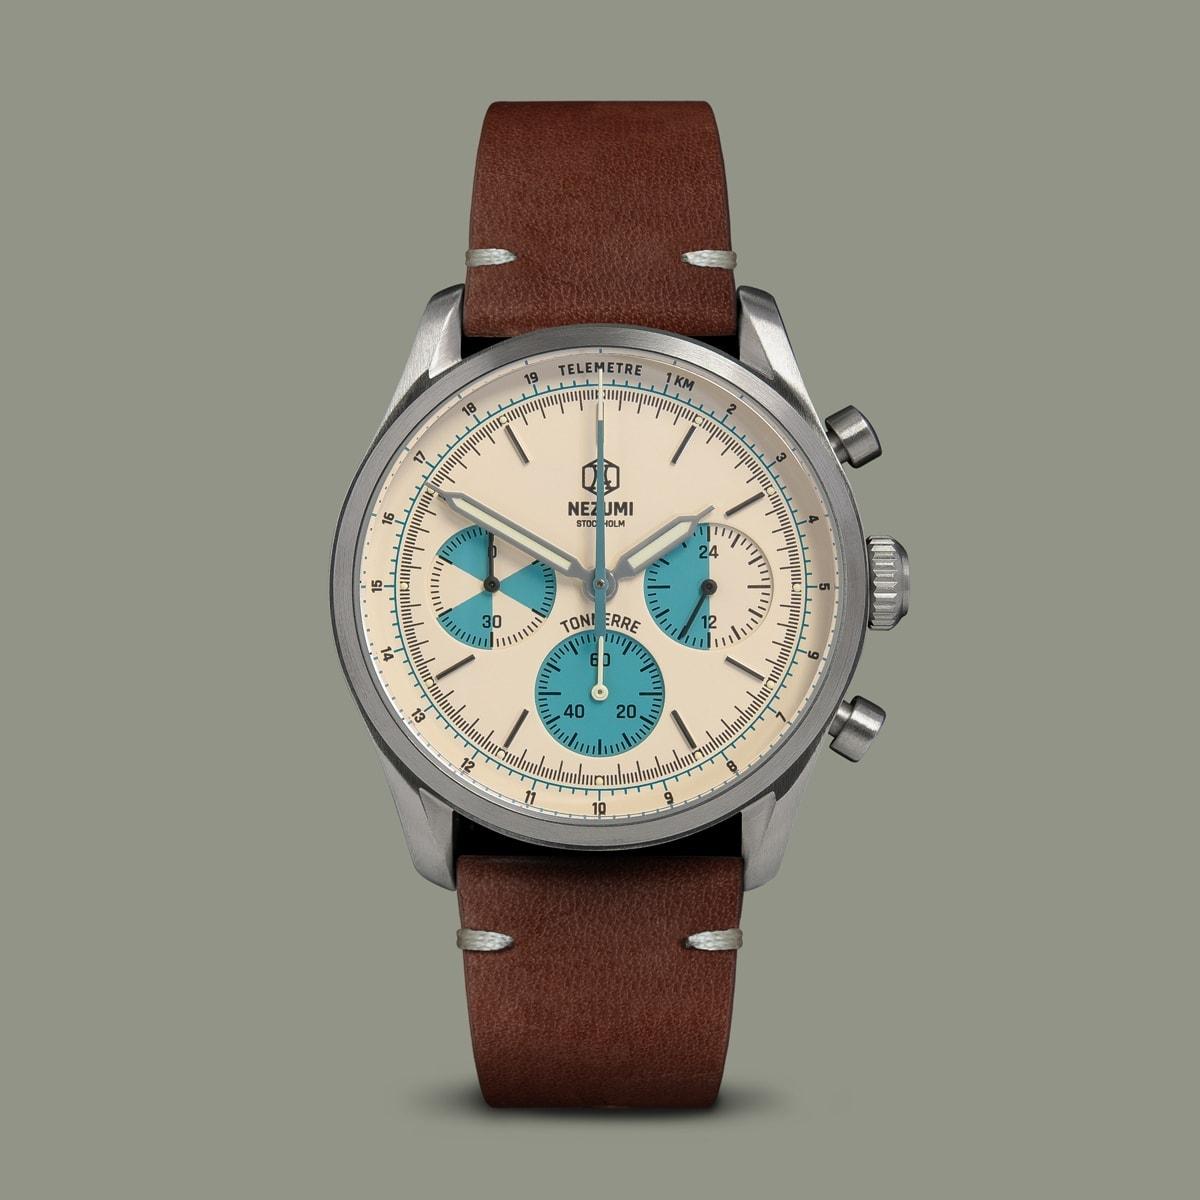 Nezumi-Tonnerre-tq1-102-telemeter-chronograph-brown-strap.jpg